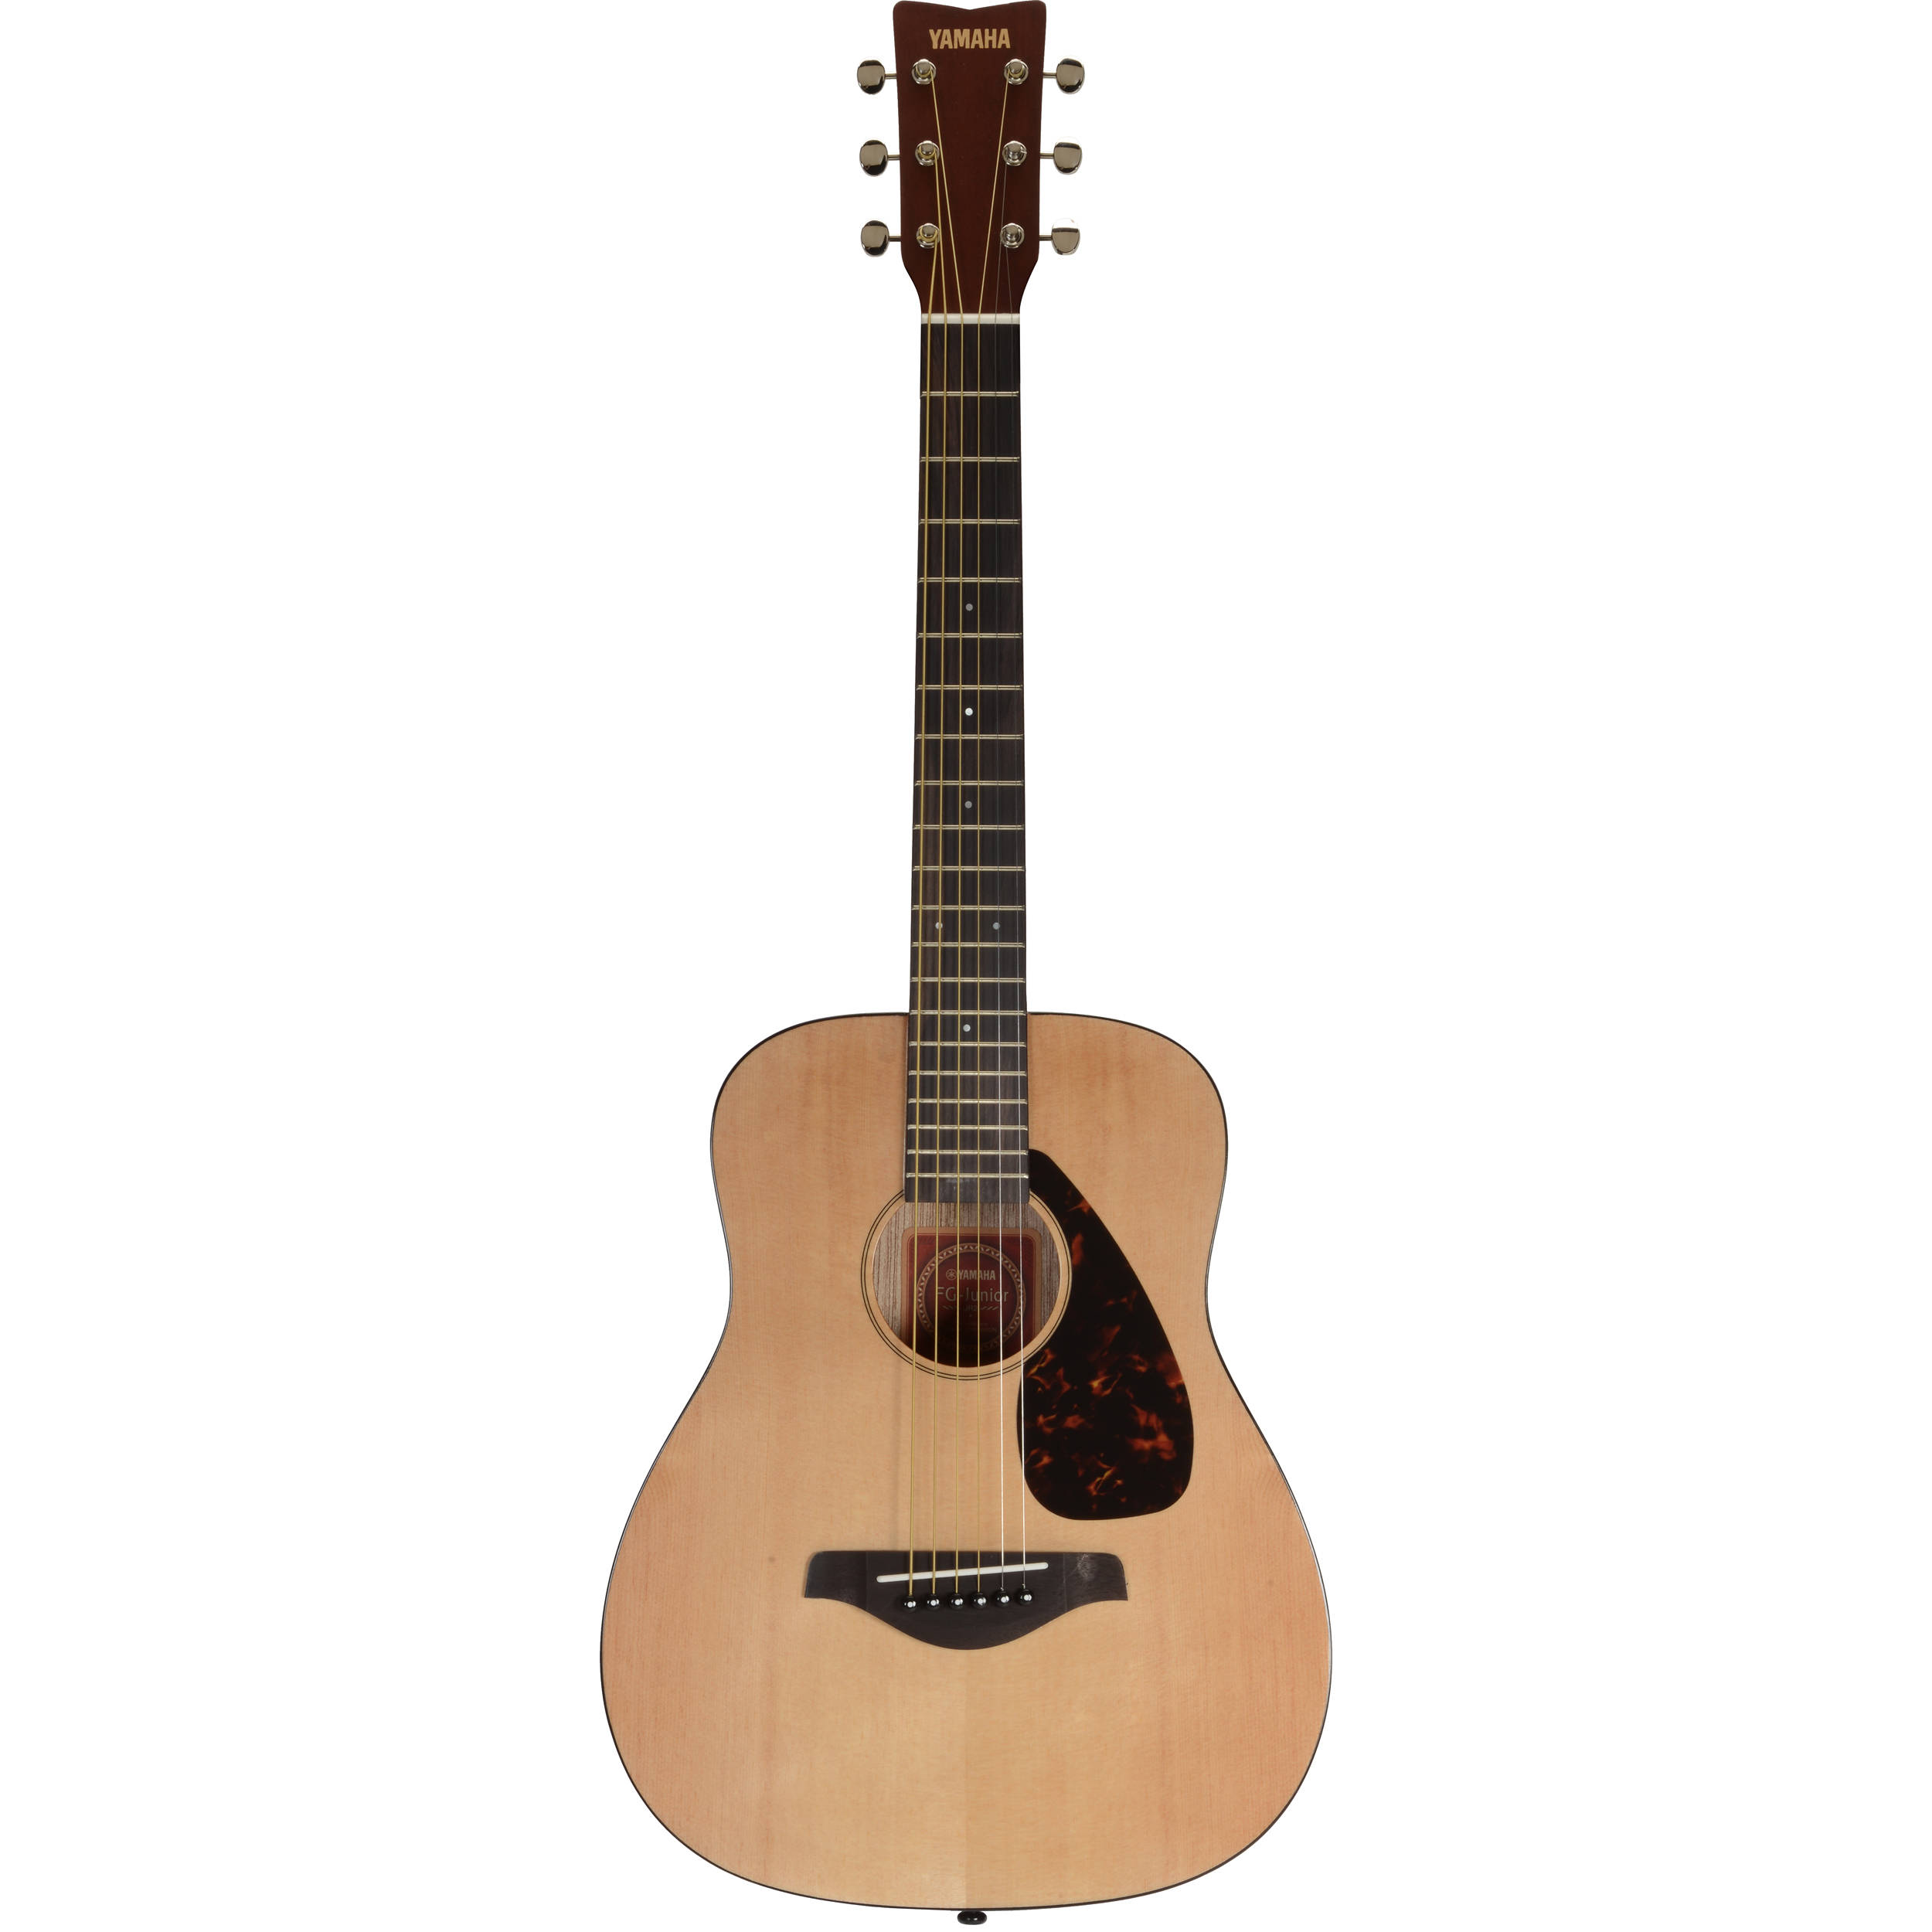 Yamaha jr2 3 4 size acoustic guitar natural jr2 b h photo for Yamaha jr2 3 4